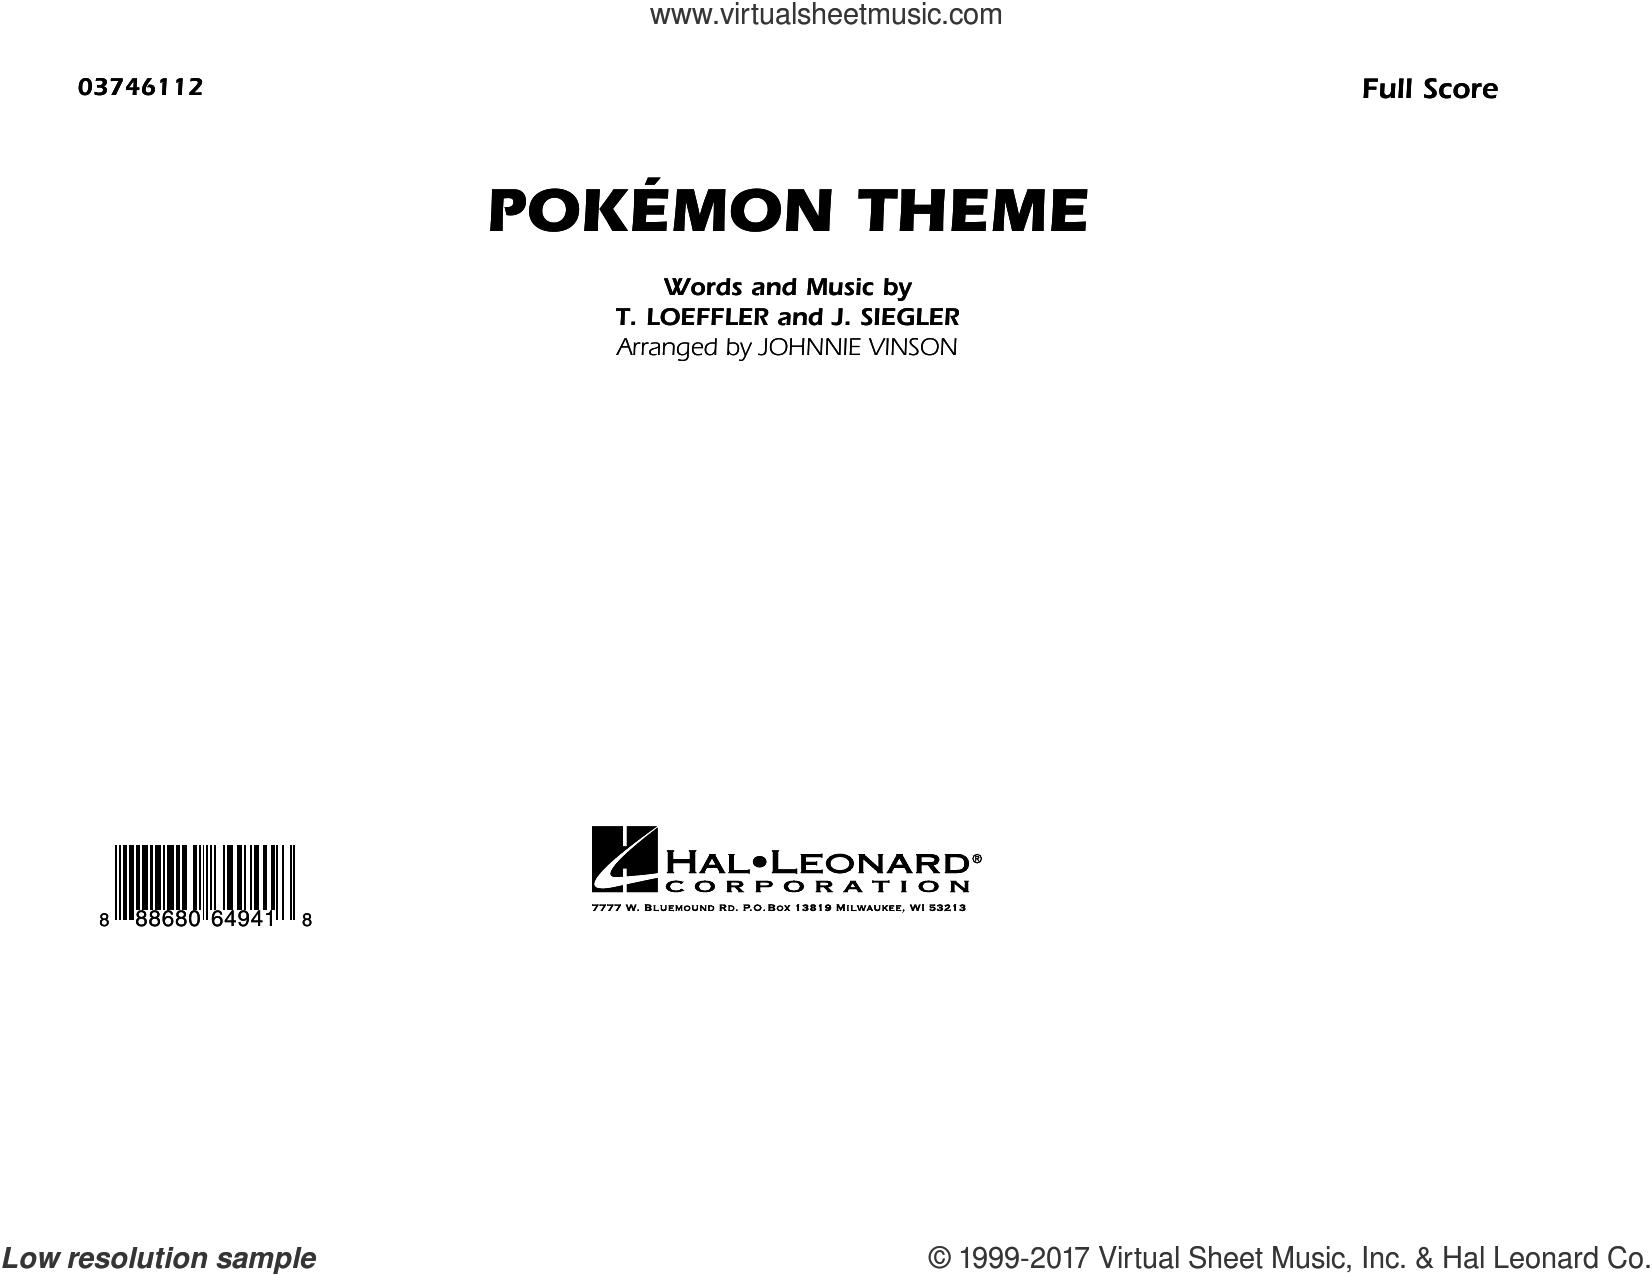 Pokemon Theme (COMPLETE) sheet music for marching band by Johnnie Vinson, J. Siegler and T. Loeffler, intermediate skill level